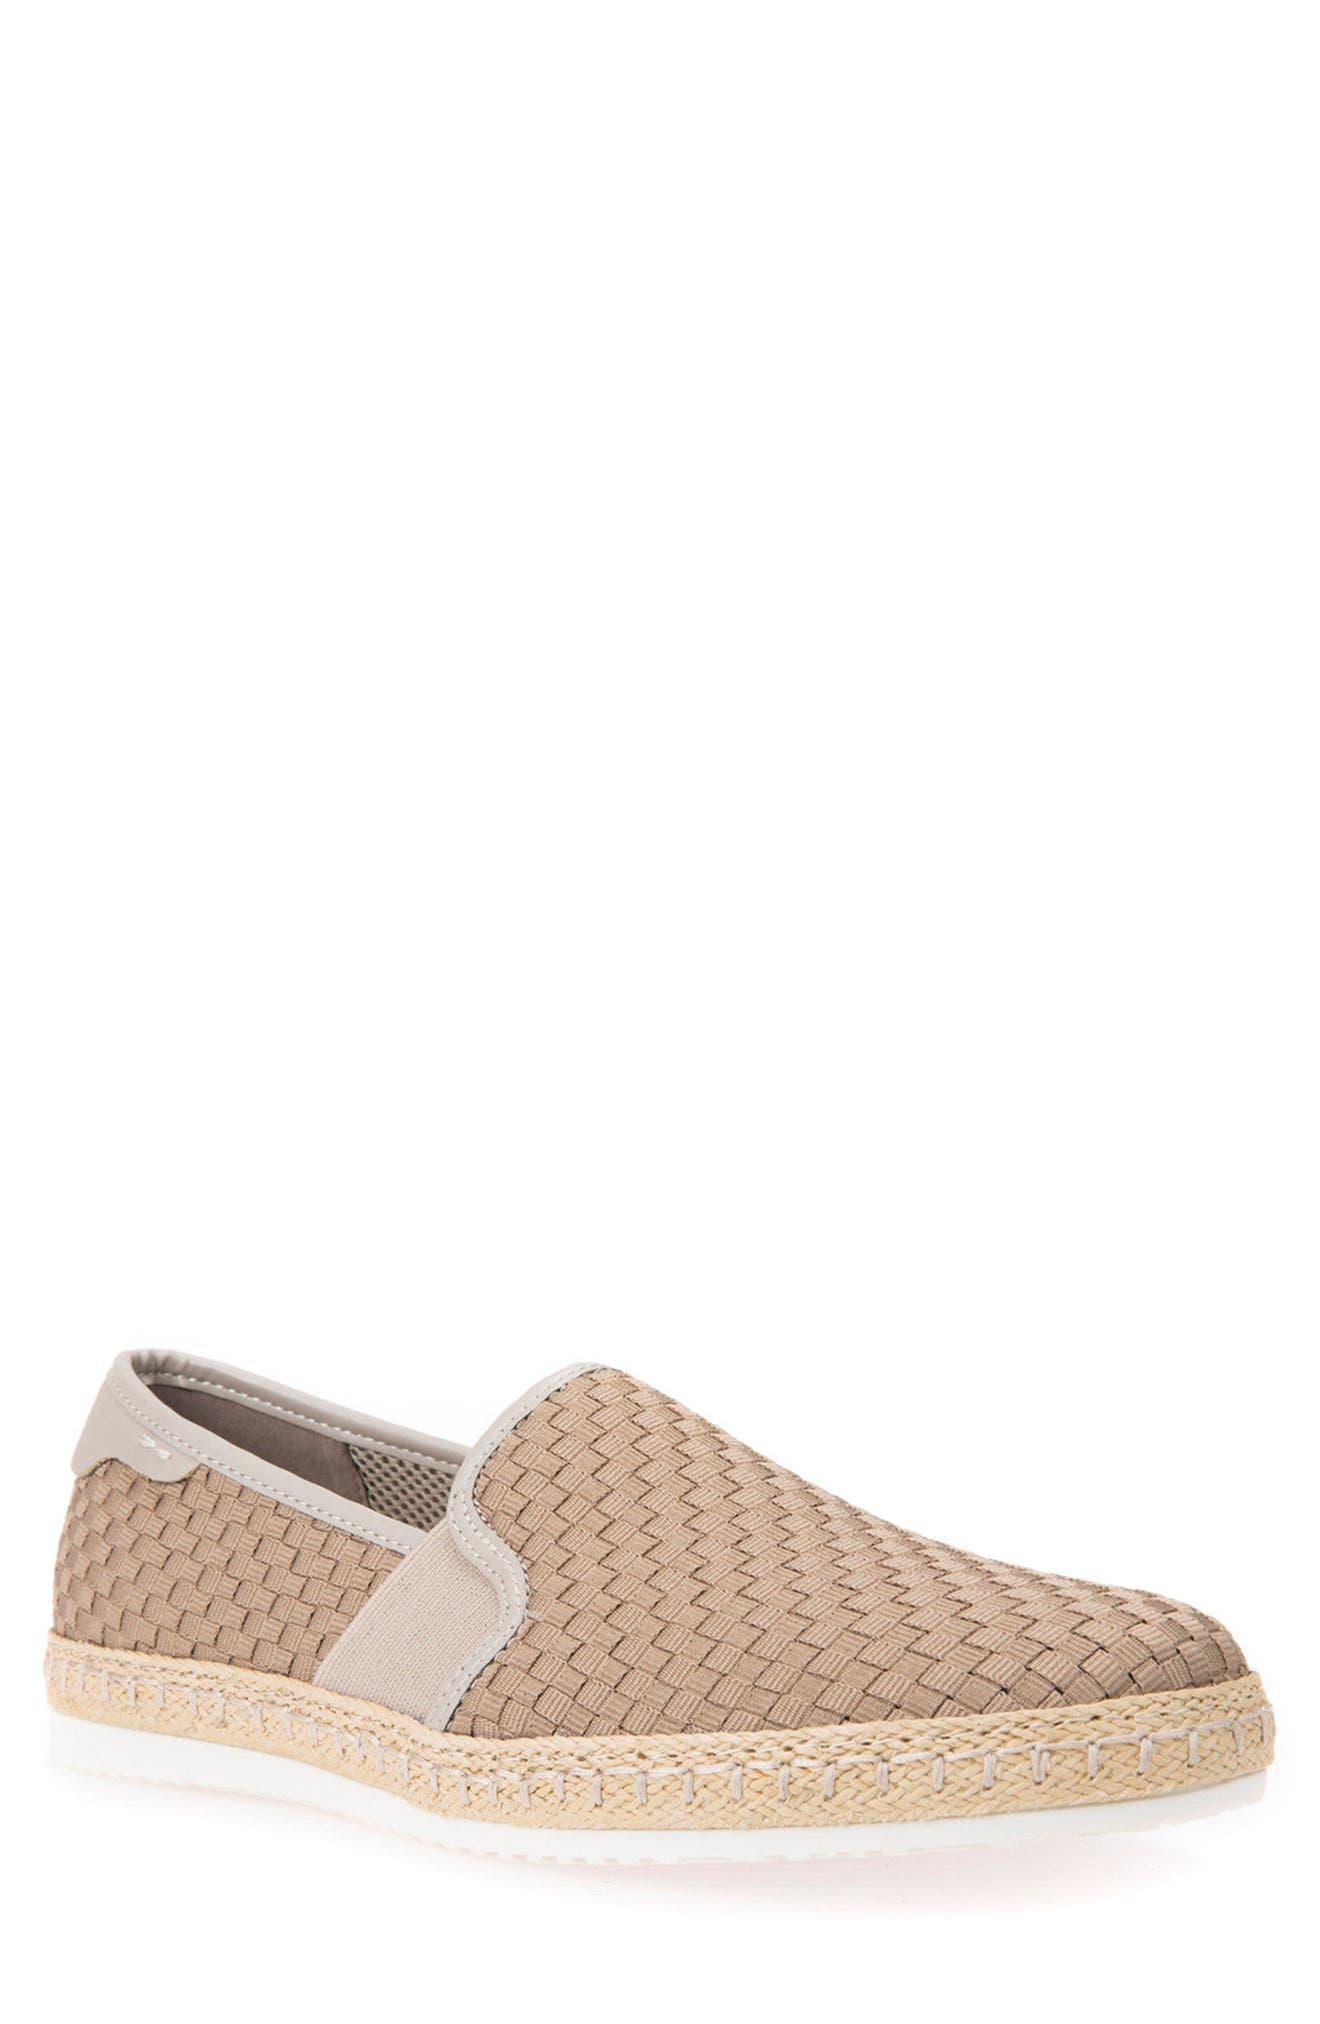 Copacaban 10 Woven Slip-On Sneaker,                         Main,                         color, Sand